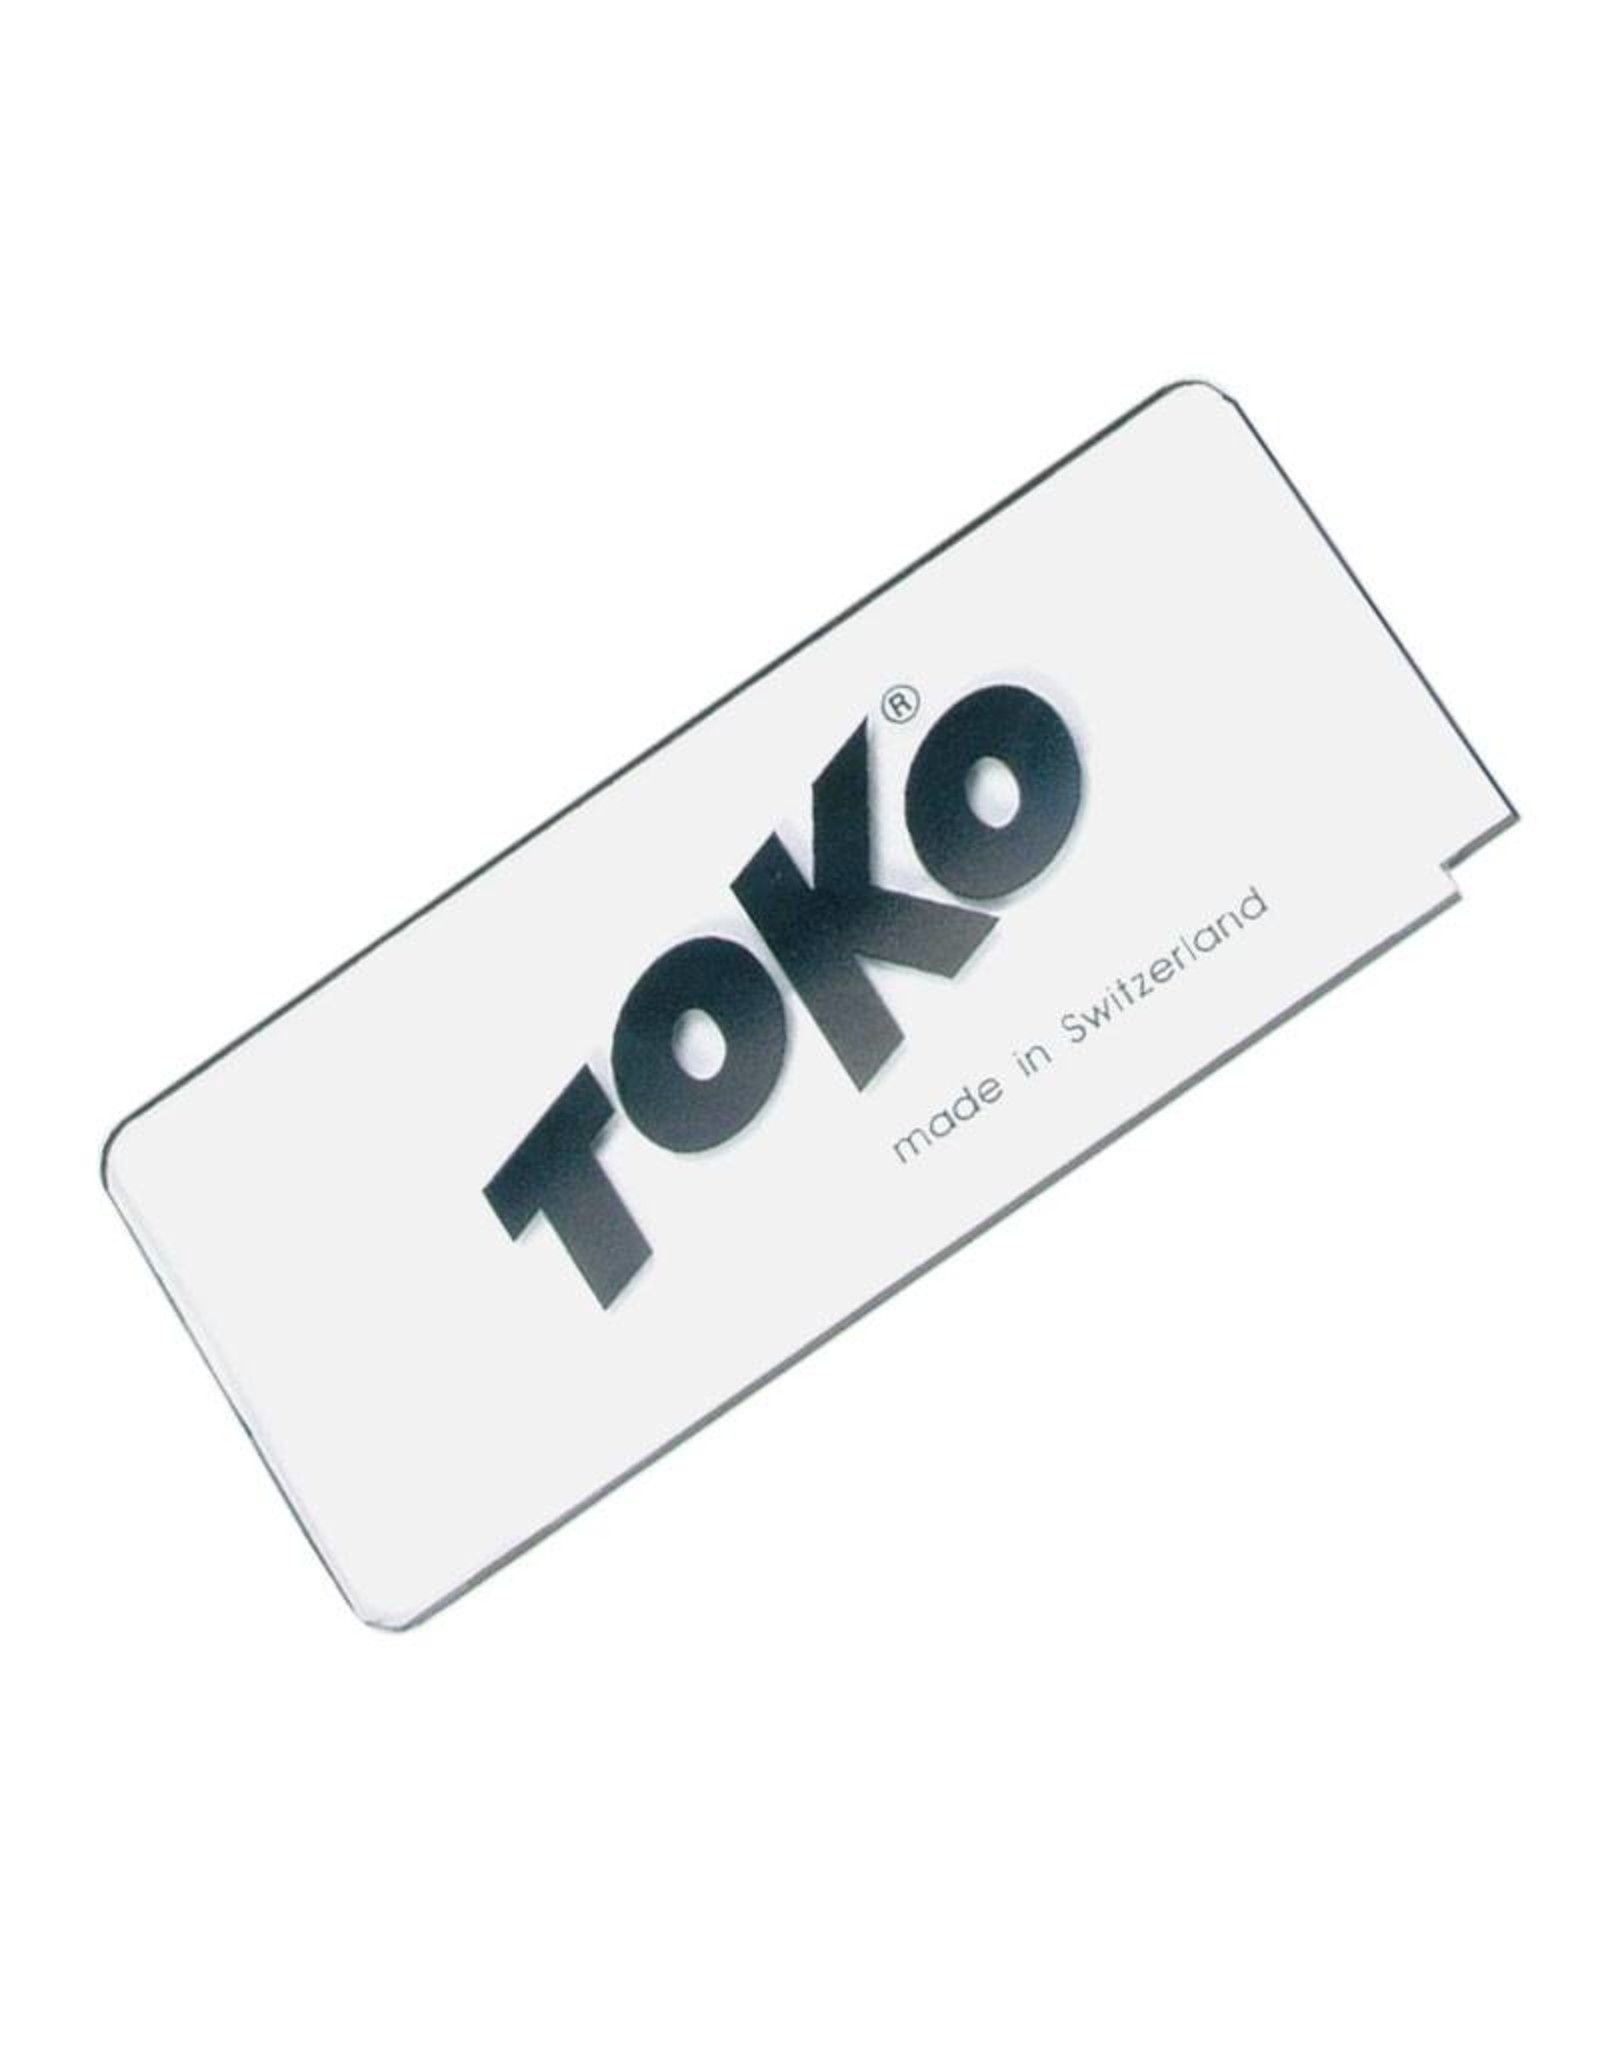 TOKO Toko Plexi Blade 3mm Backs